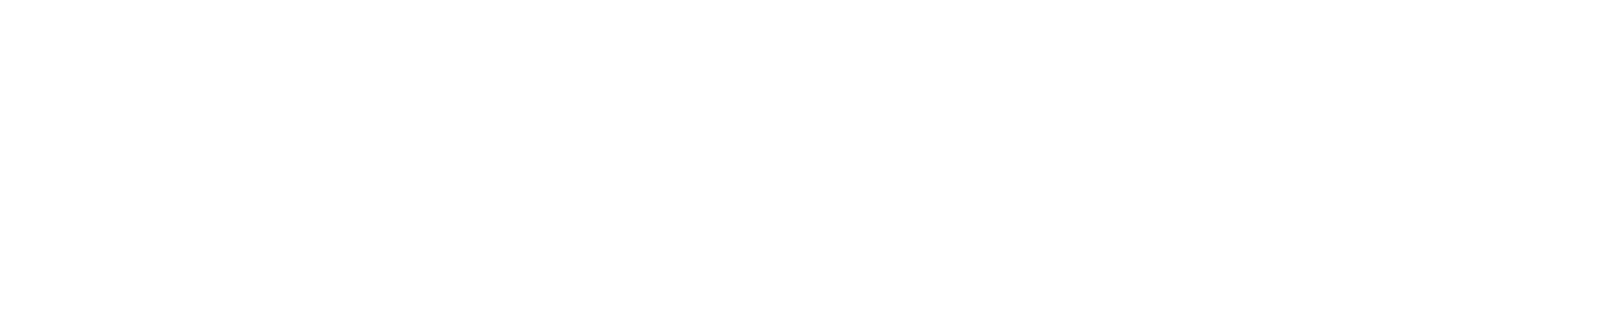 102-1025542_facebook-logo-white-png